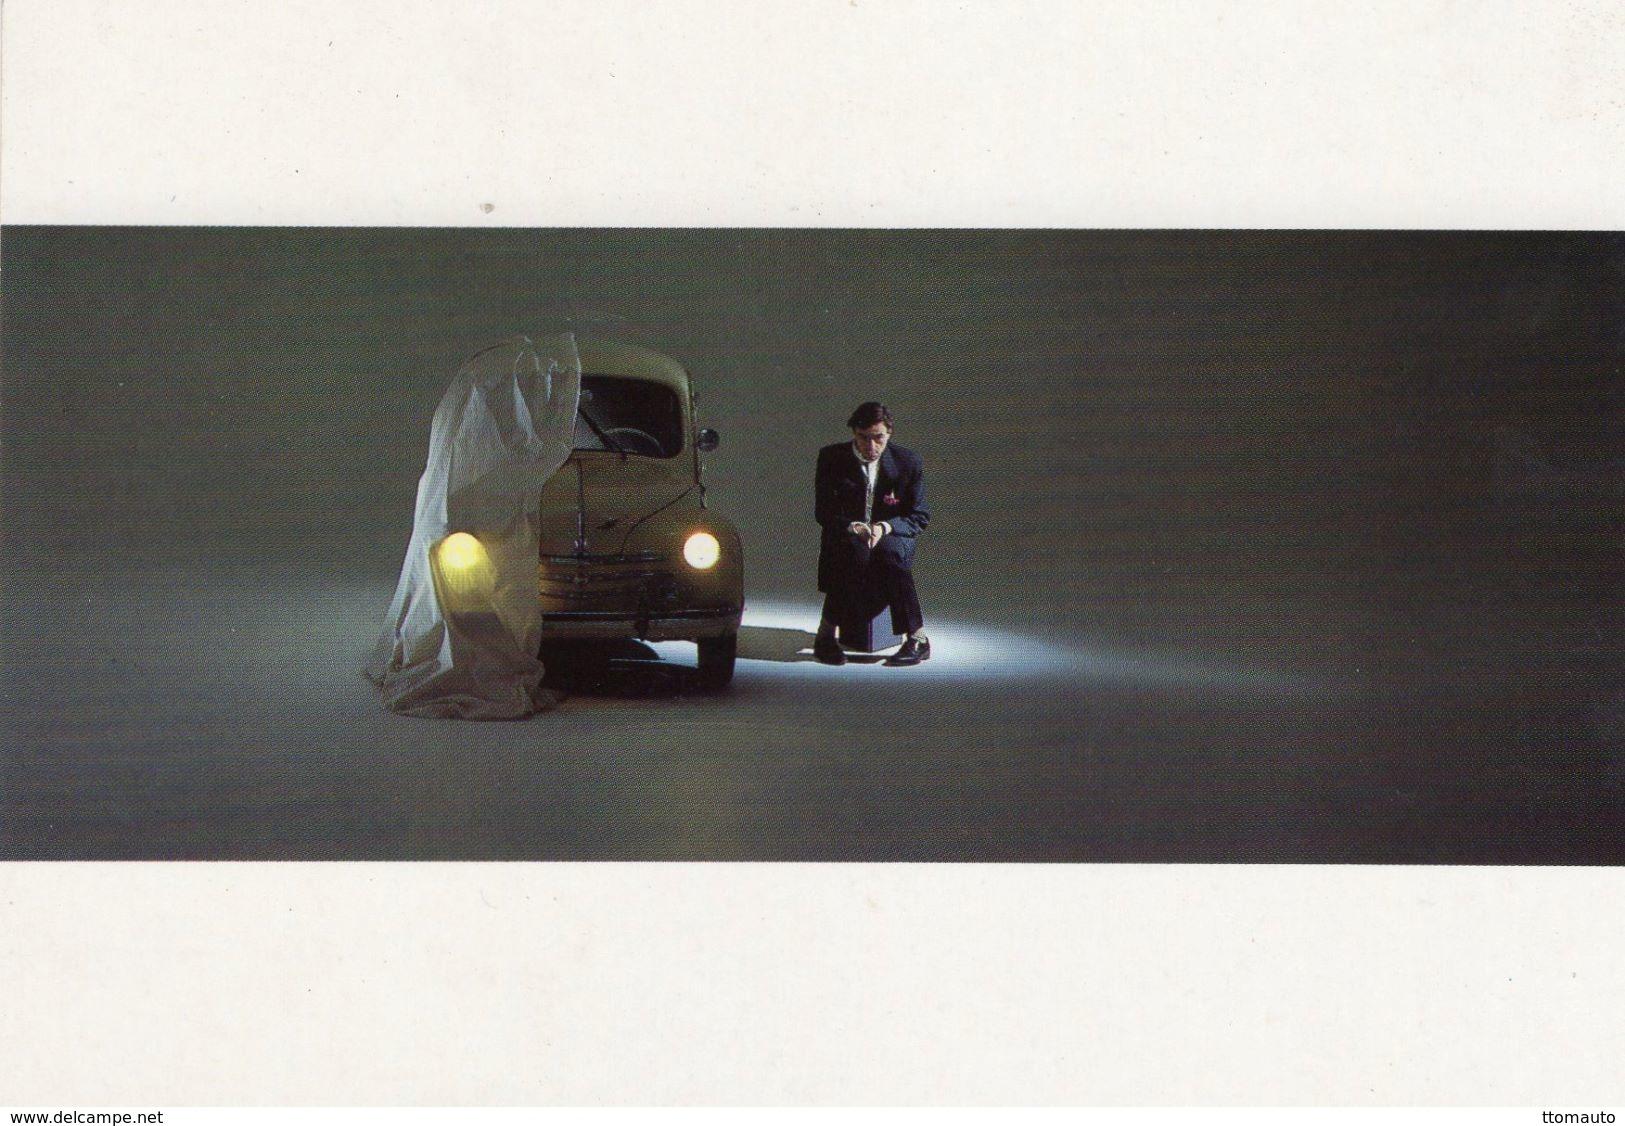 Renault 4CV  -  Jean-Luc Dubin Photocarte  -  CPM - Turismo